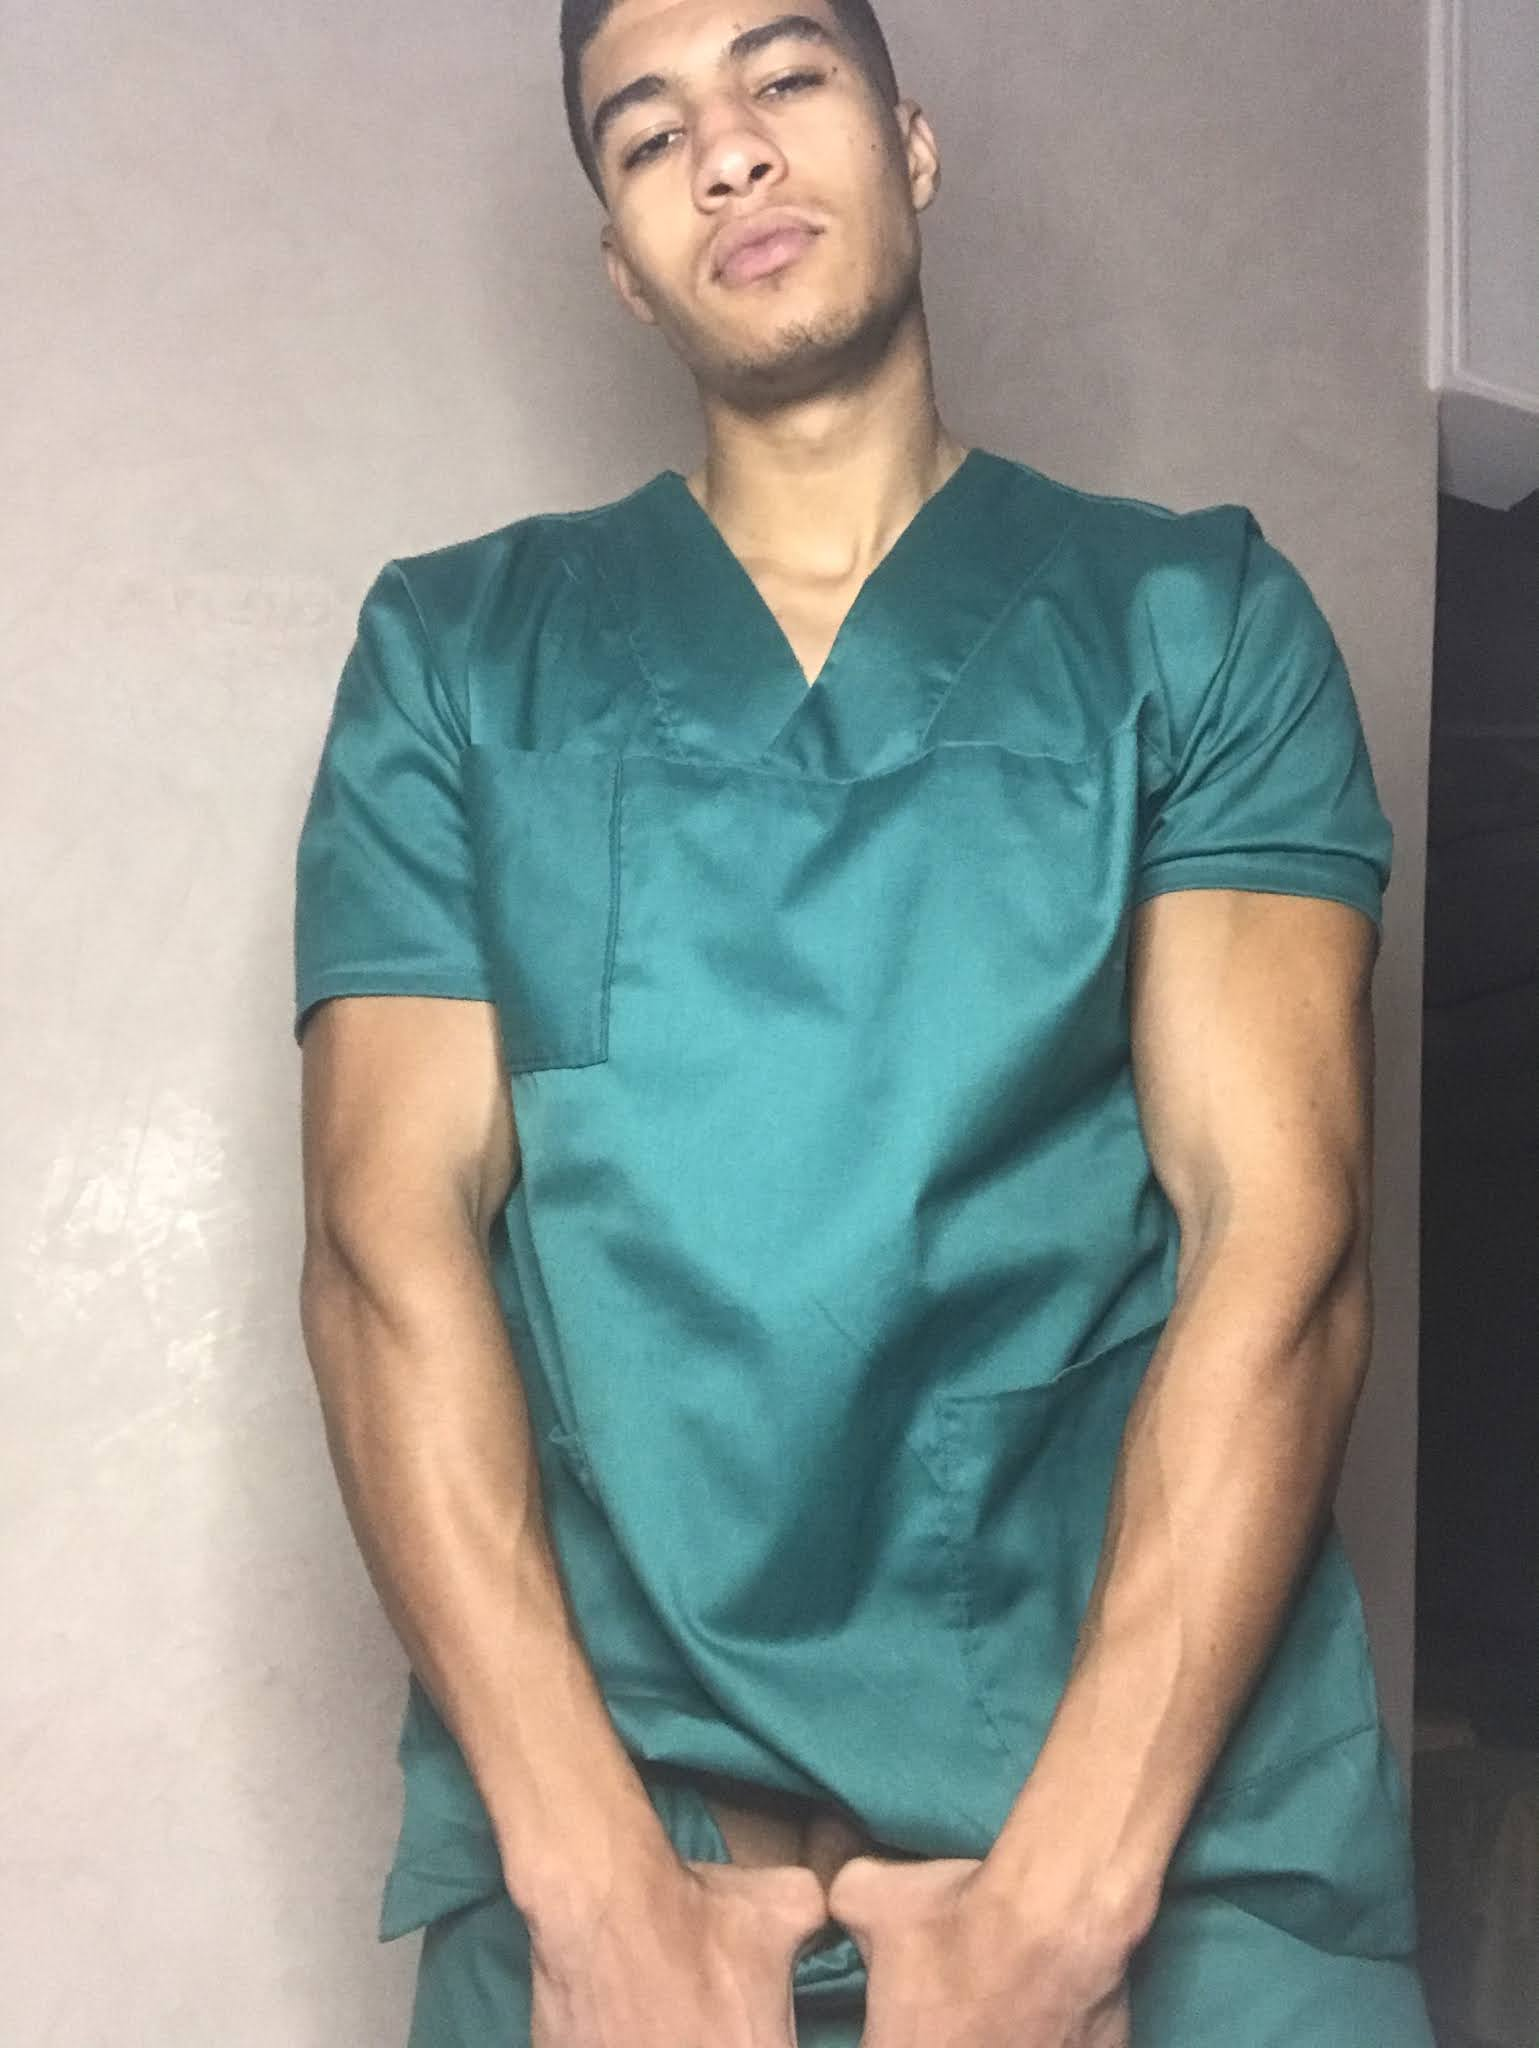 enfermero cachondo